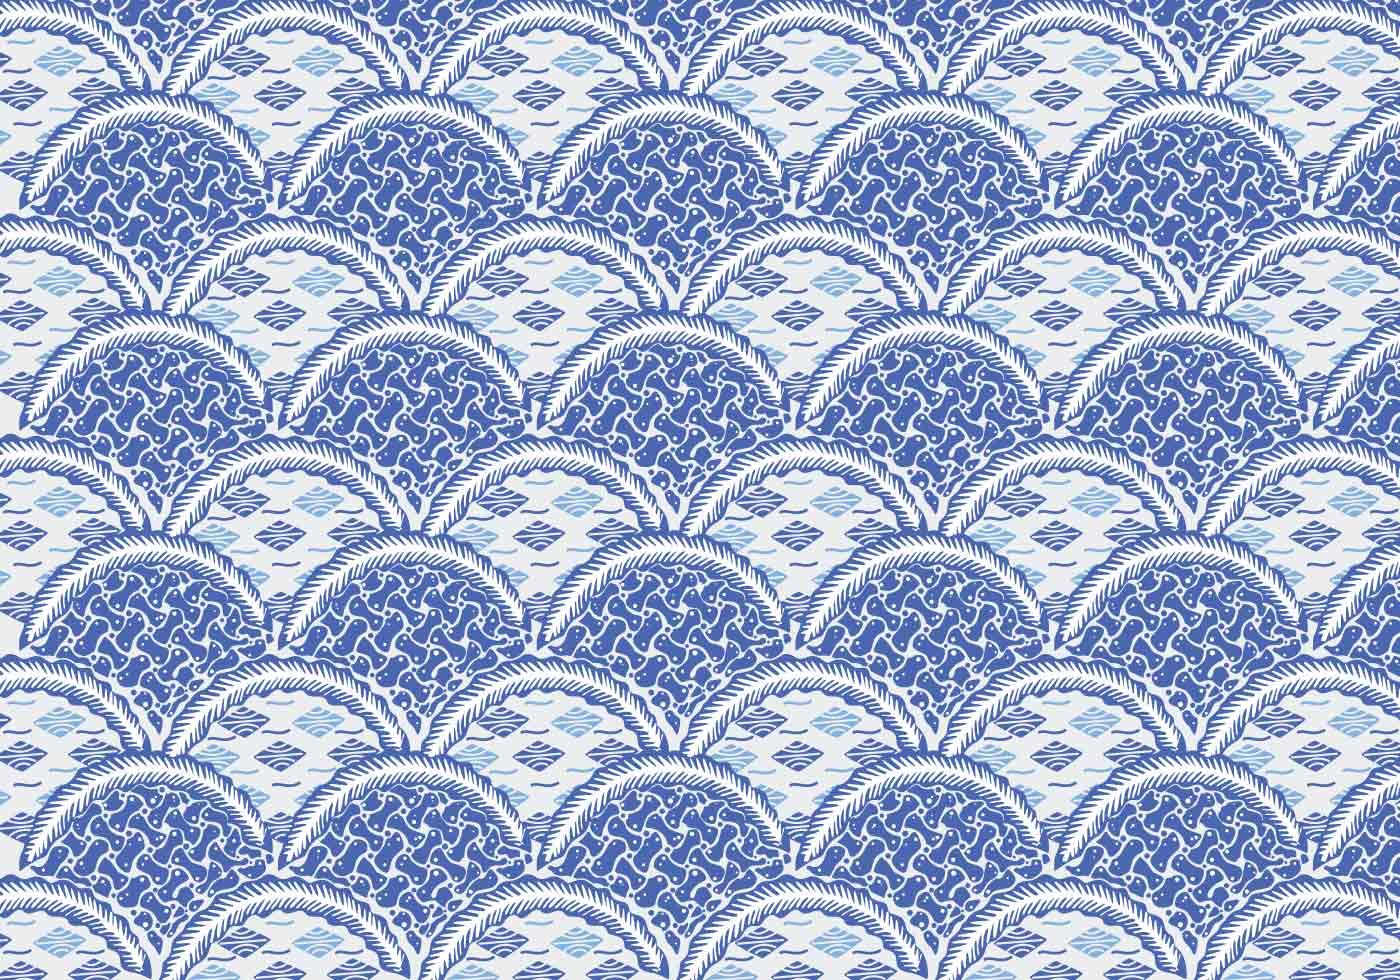 Batik Modern Vector - Download Free Vector Art, Stock ...